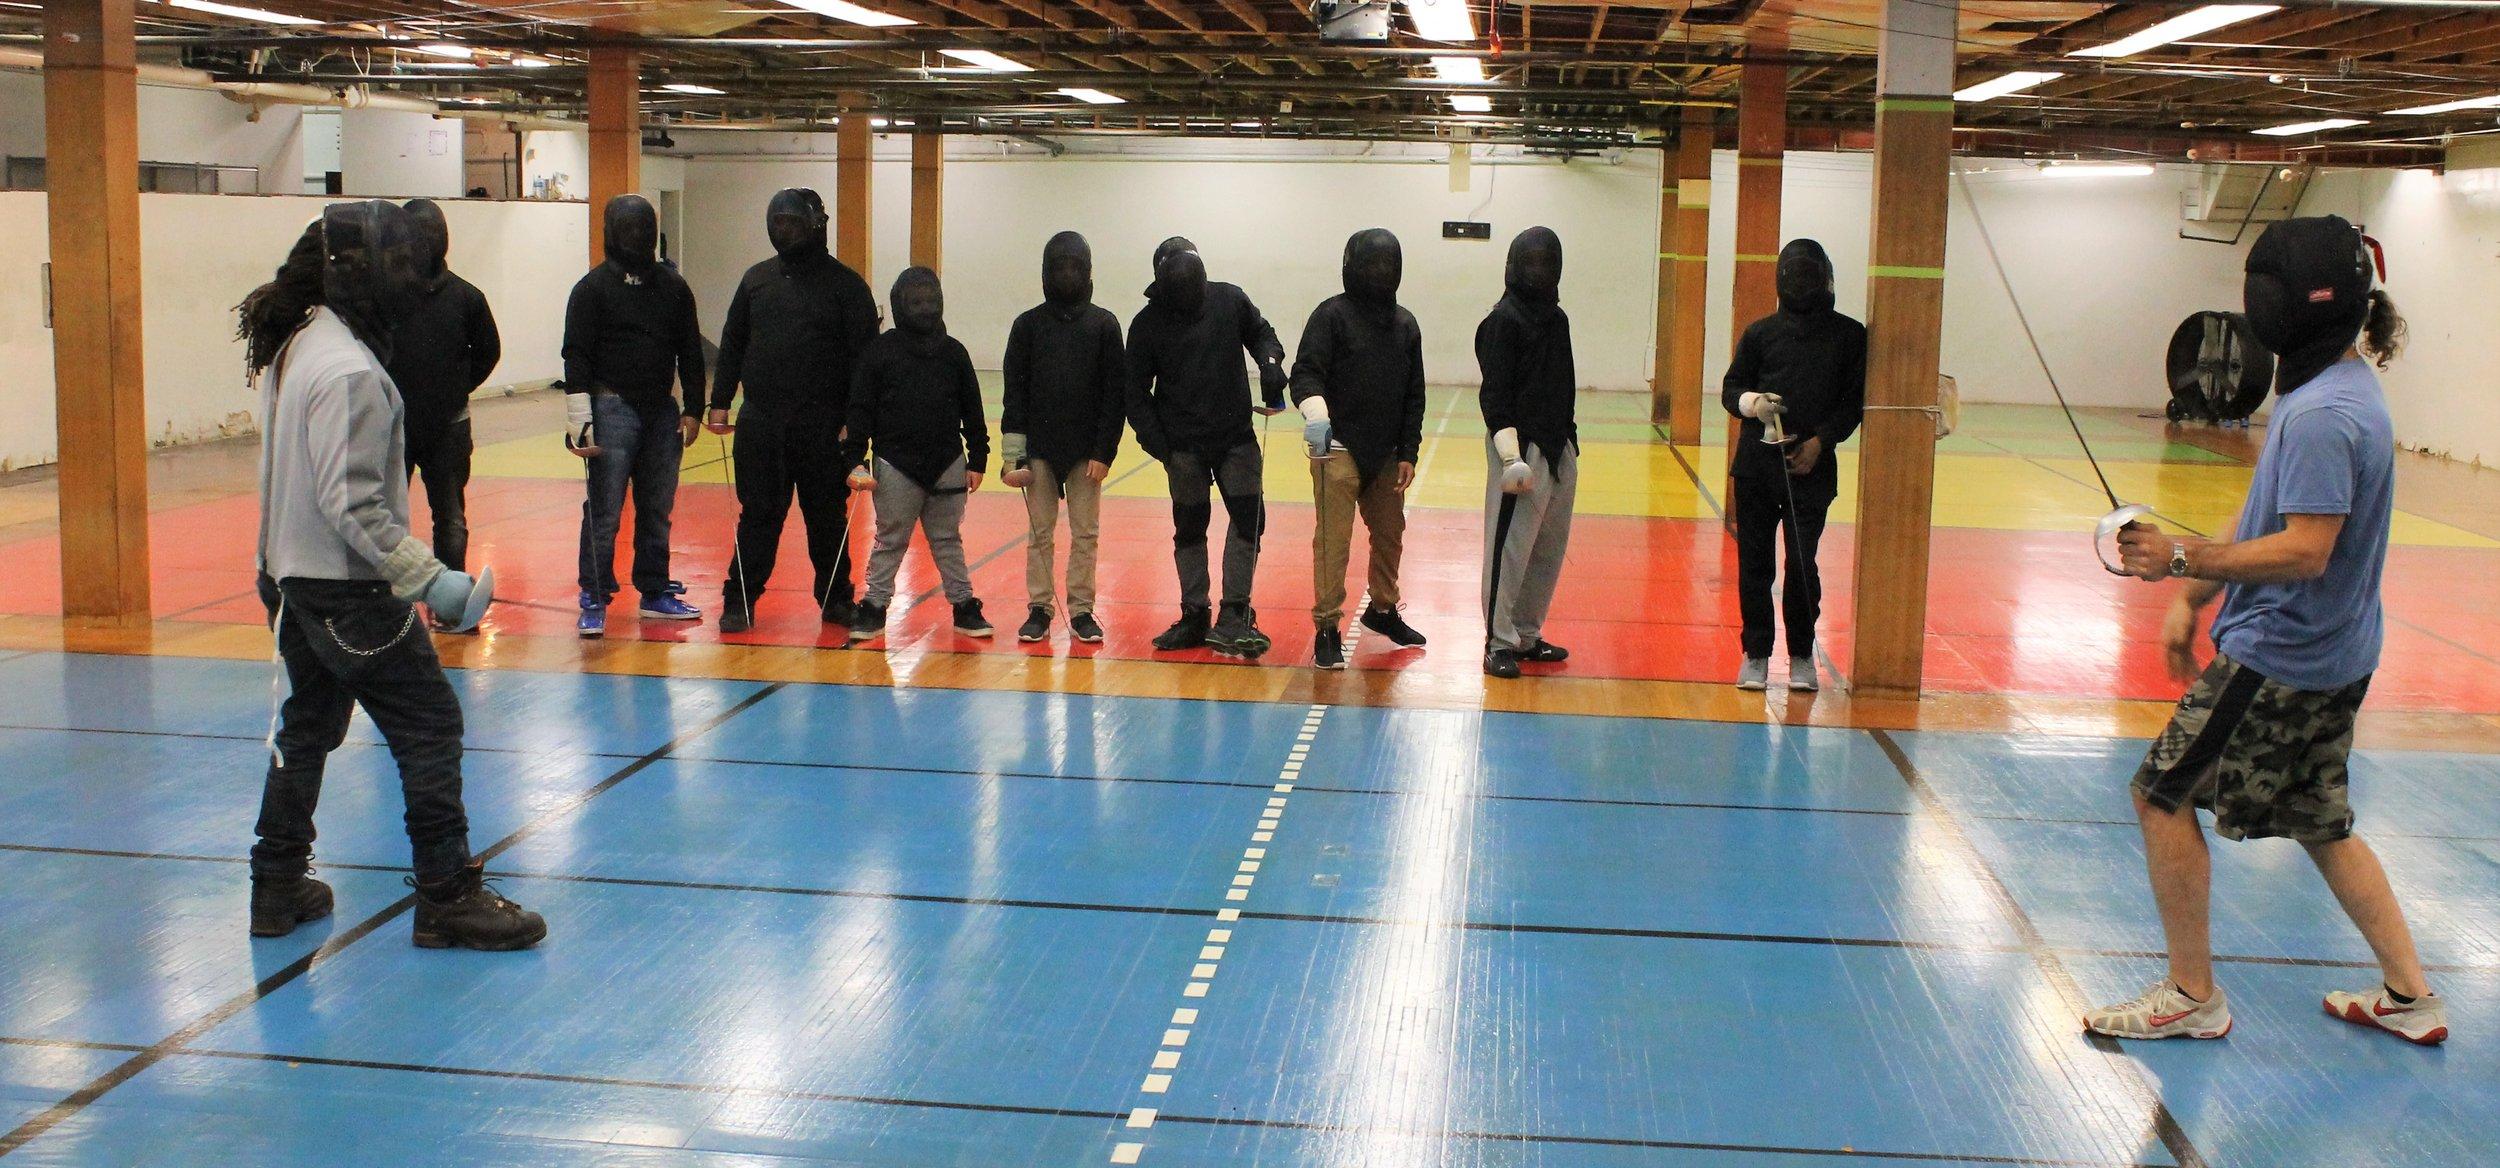 New Lens Urban Mentoring Society with Minnesota Swords Club Fencing #NewLensSociety 07.JPG